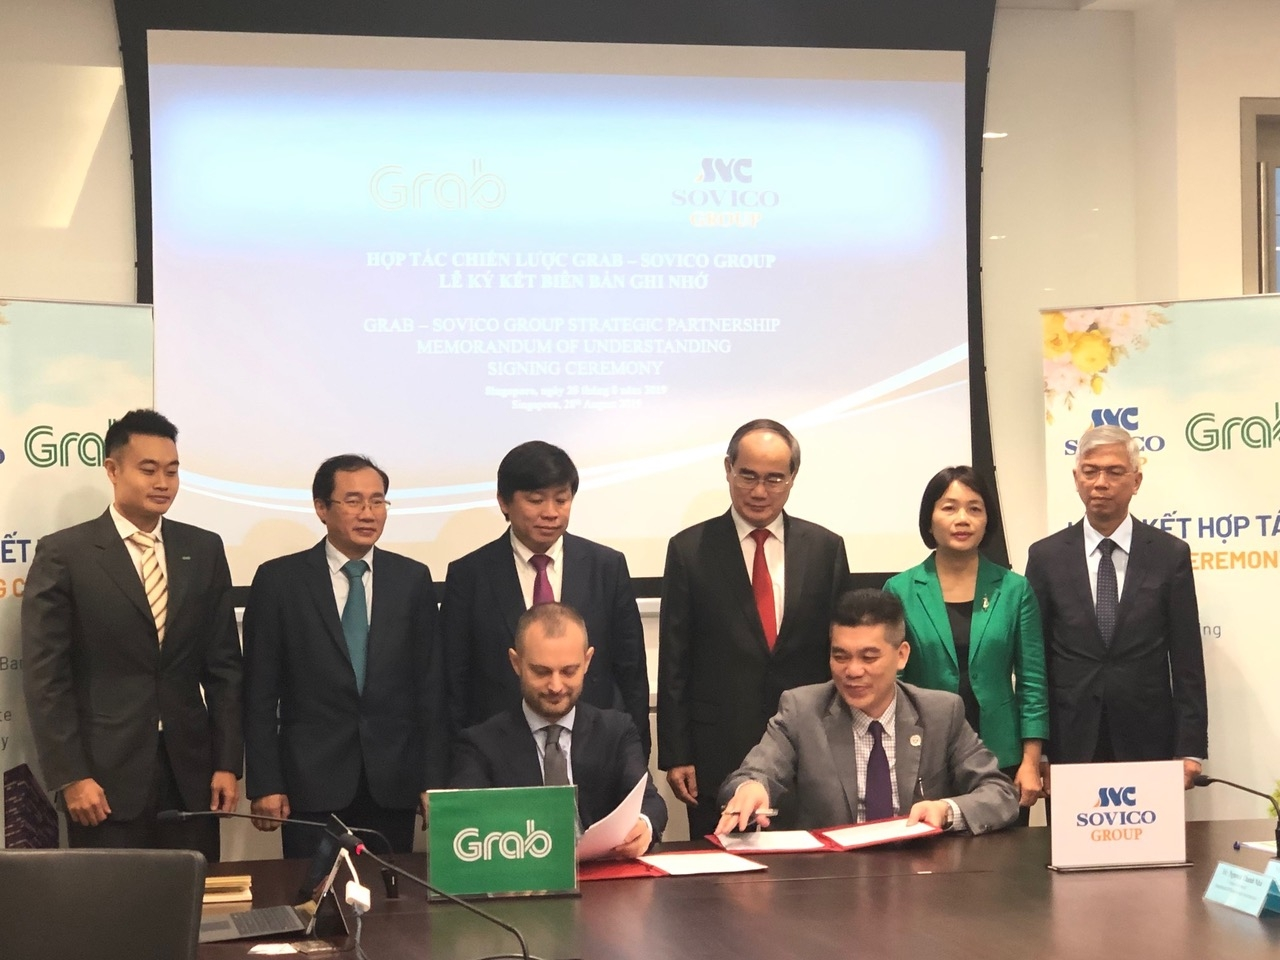 grab and sovico group sign comprehensive strategic partnership